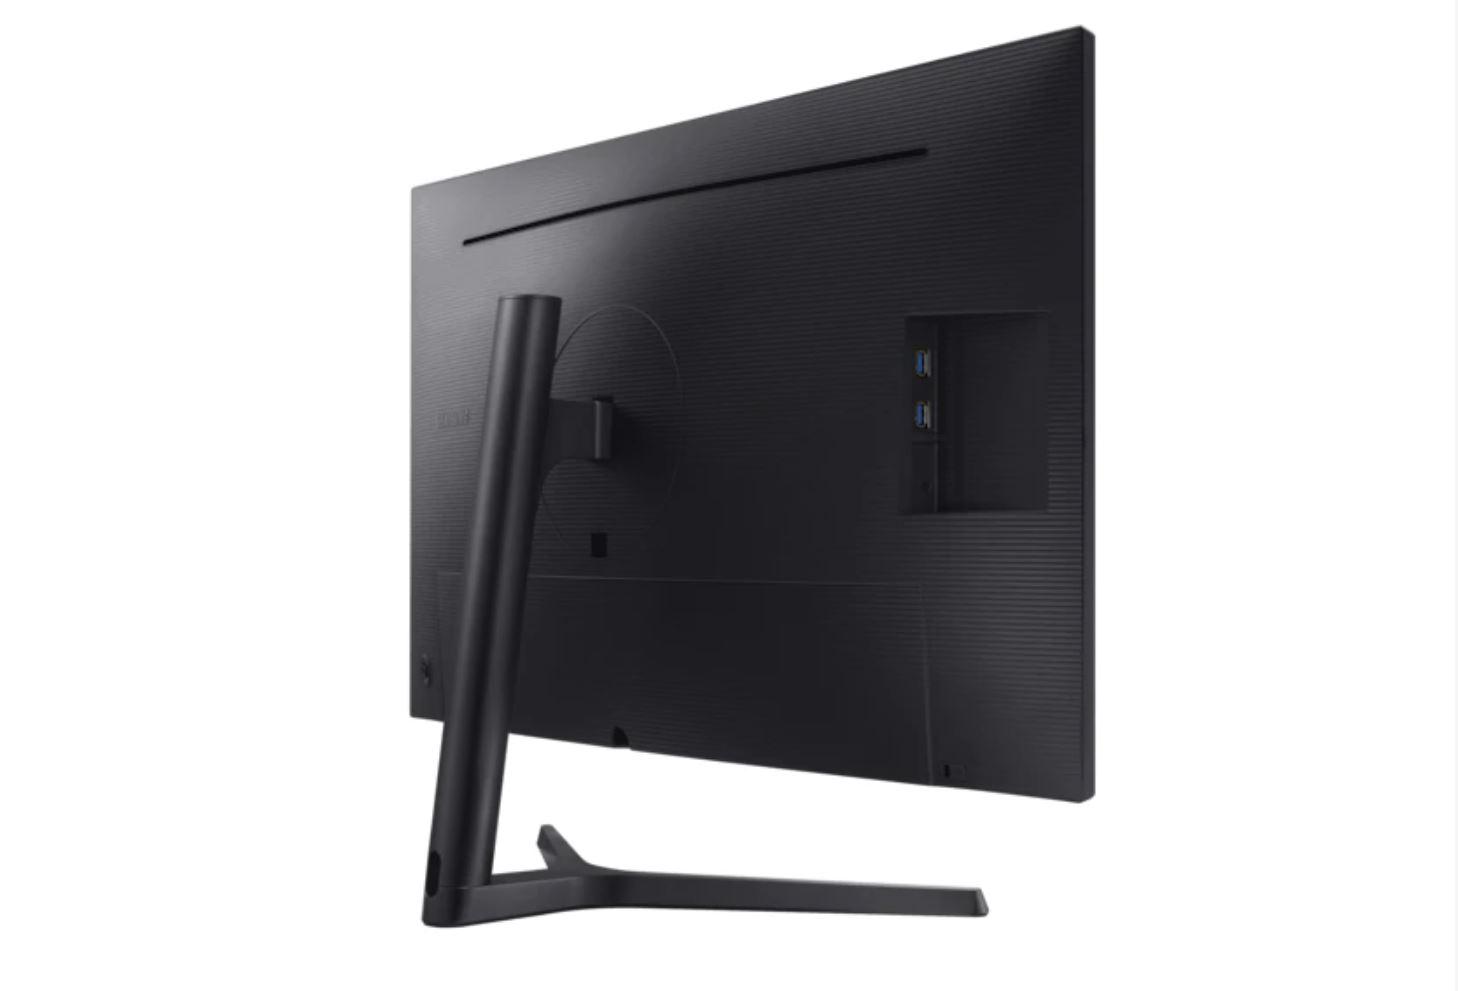 Samsung LU32H850UMUXEN recenzja test opinia monitor